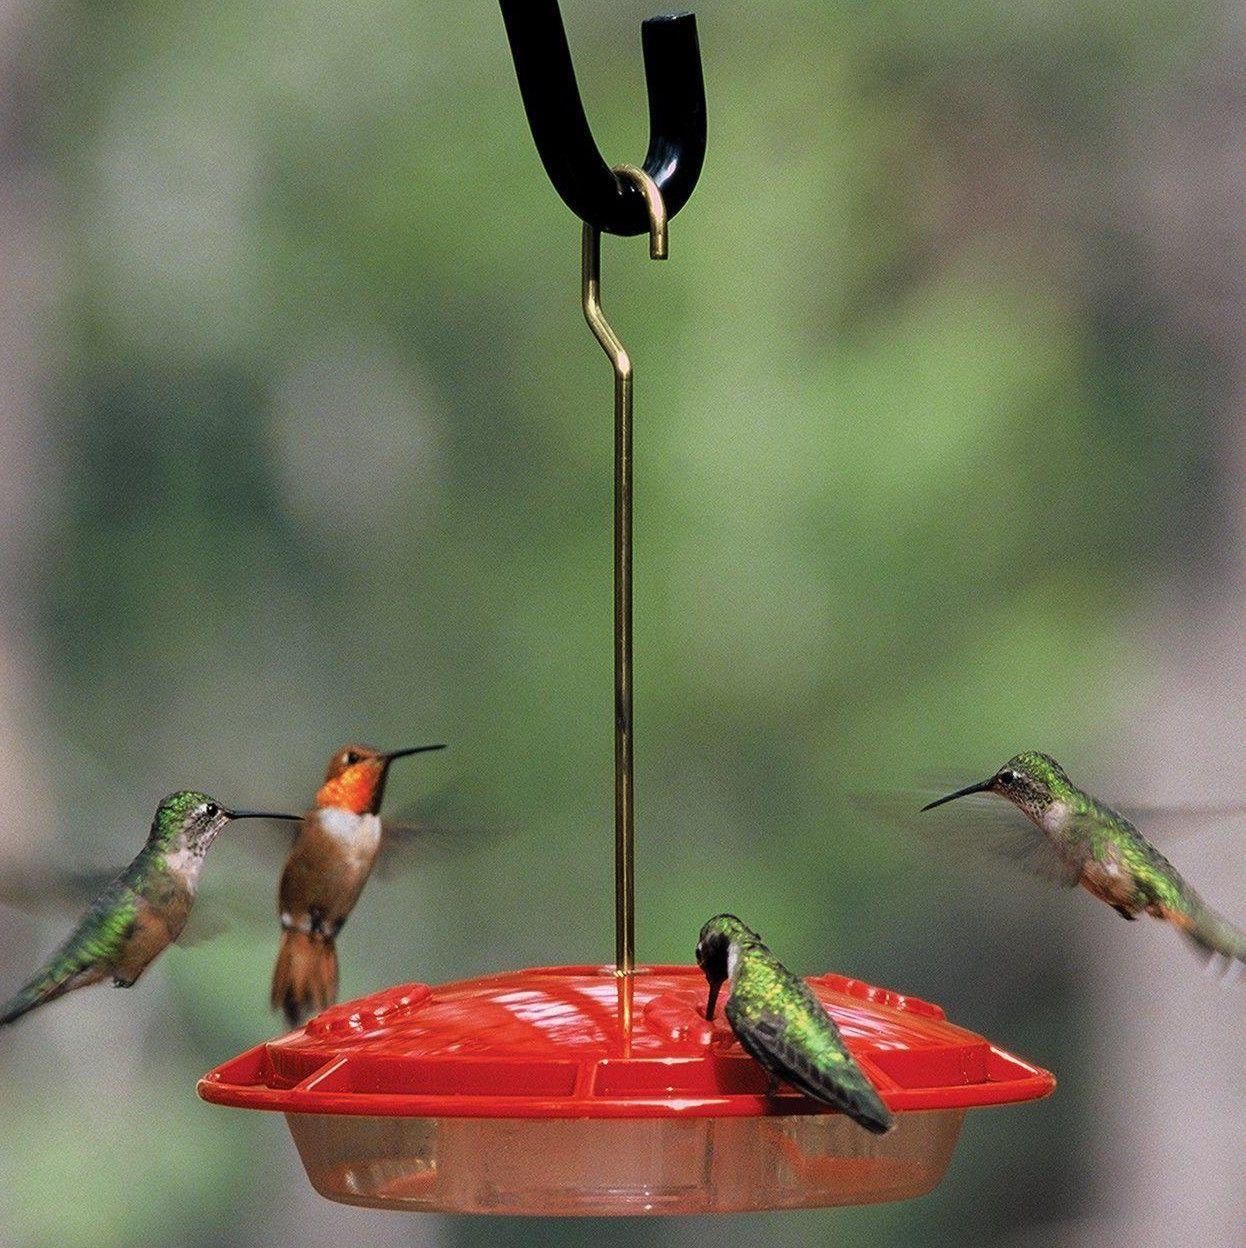 Hummzinger Ultran Hummingbird Feeder Feeder Hummingbird Hummzinger Ultran In 2020 Humming Bird Feeders Wild Bird Feeders How To Attract Hummingbirds